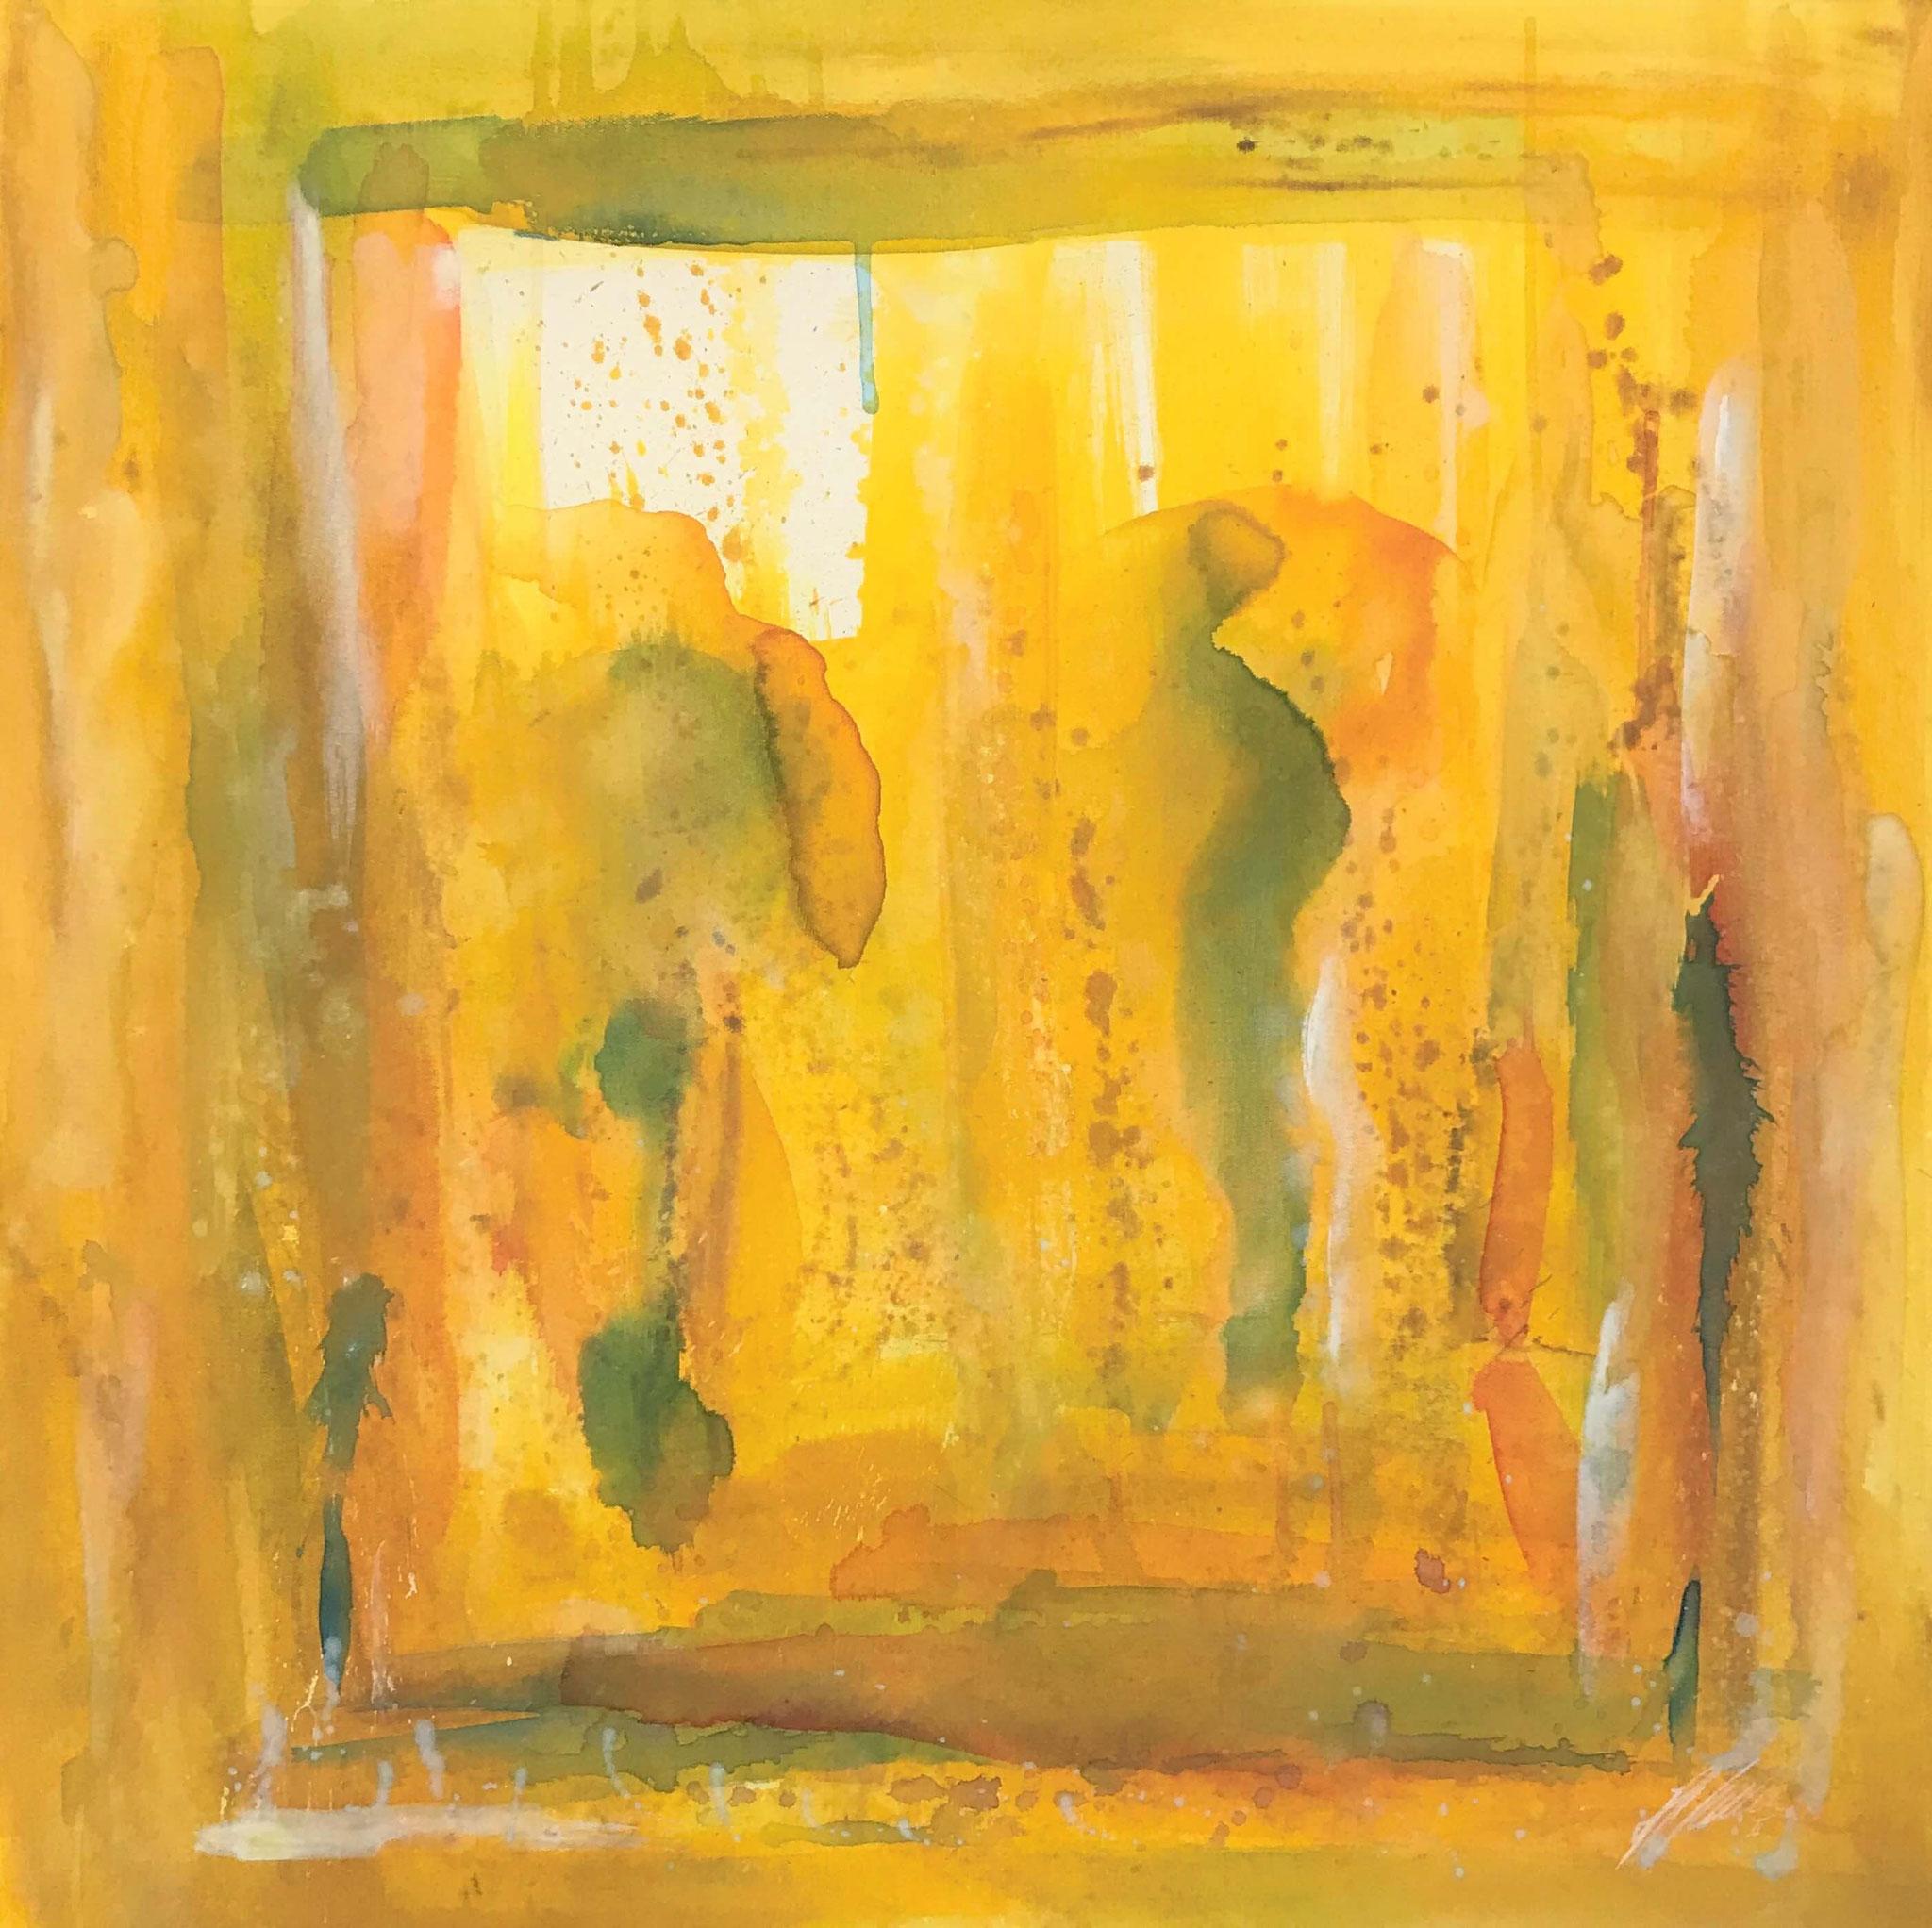 "Fr. 580.00 ""Zwilling, Serie abstract"" Acryl auf Leinwand mit Rahmen 80 x 80 cm."